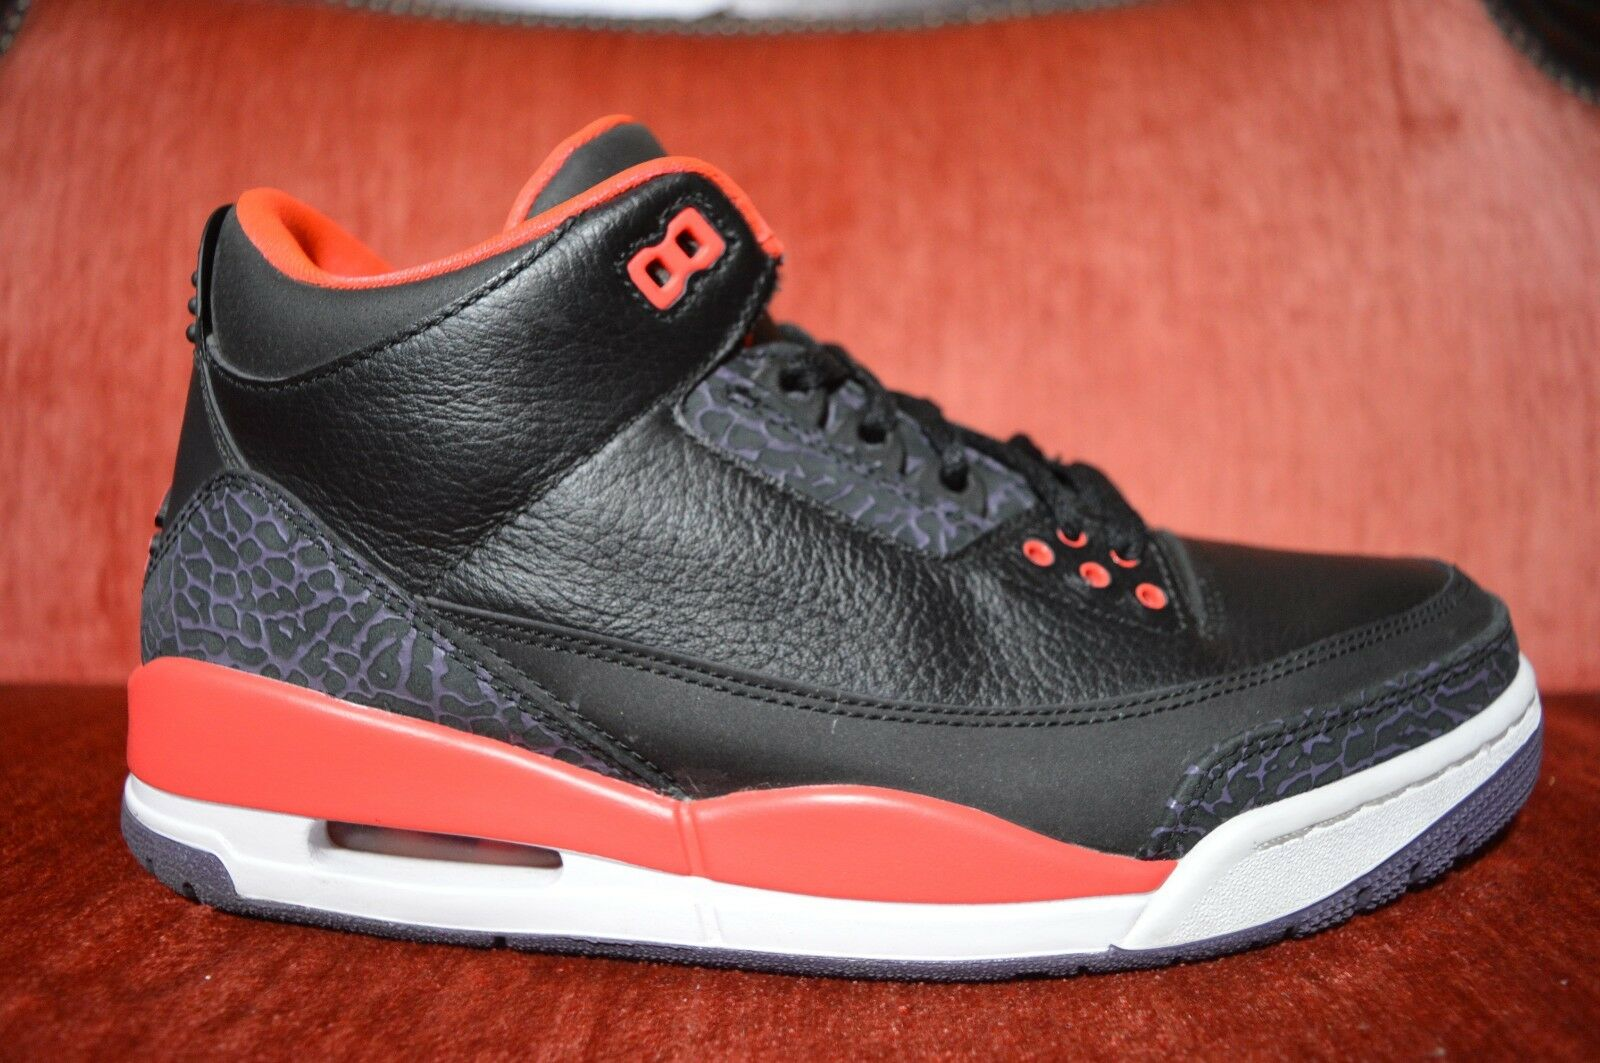 Nike Crimson Air Jordan 3 retro Crimson Nike 136064-005 Hombre zapatos comodos Wild Casual Shoes 3ffc63